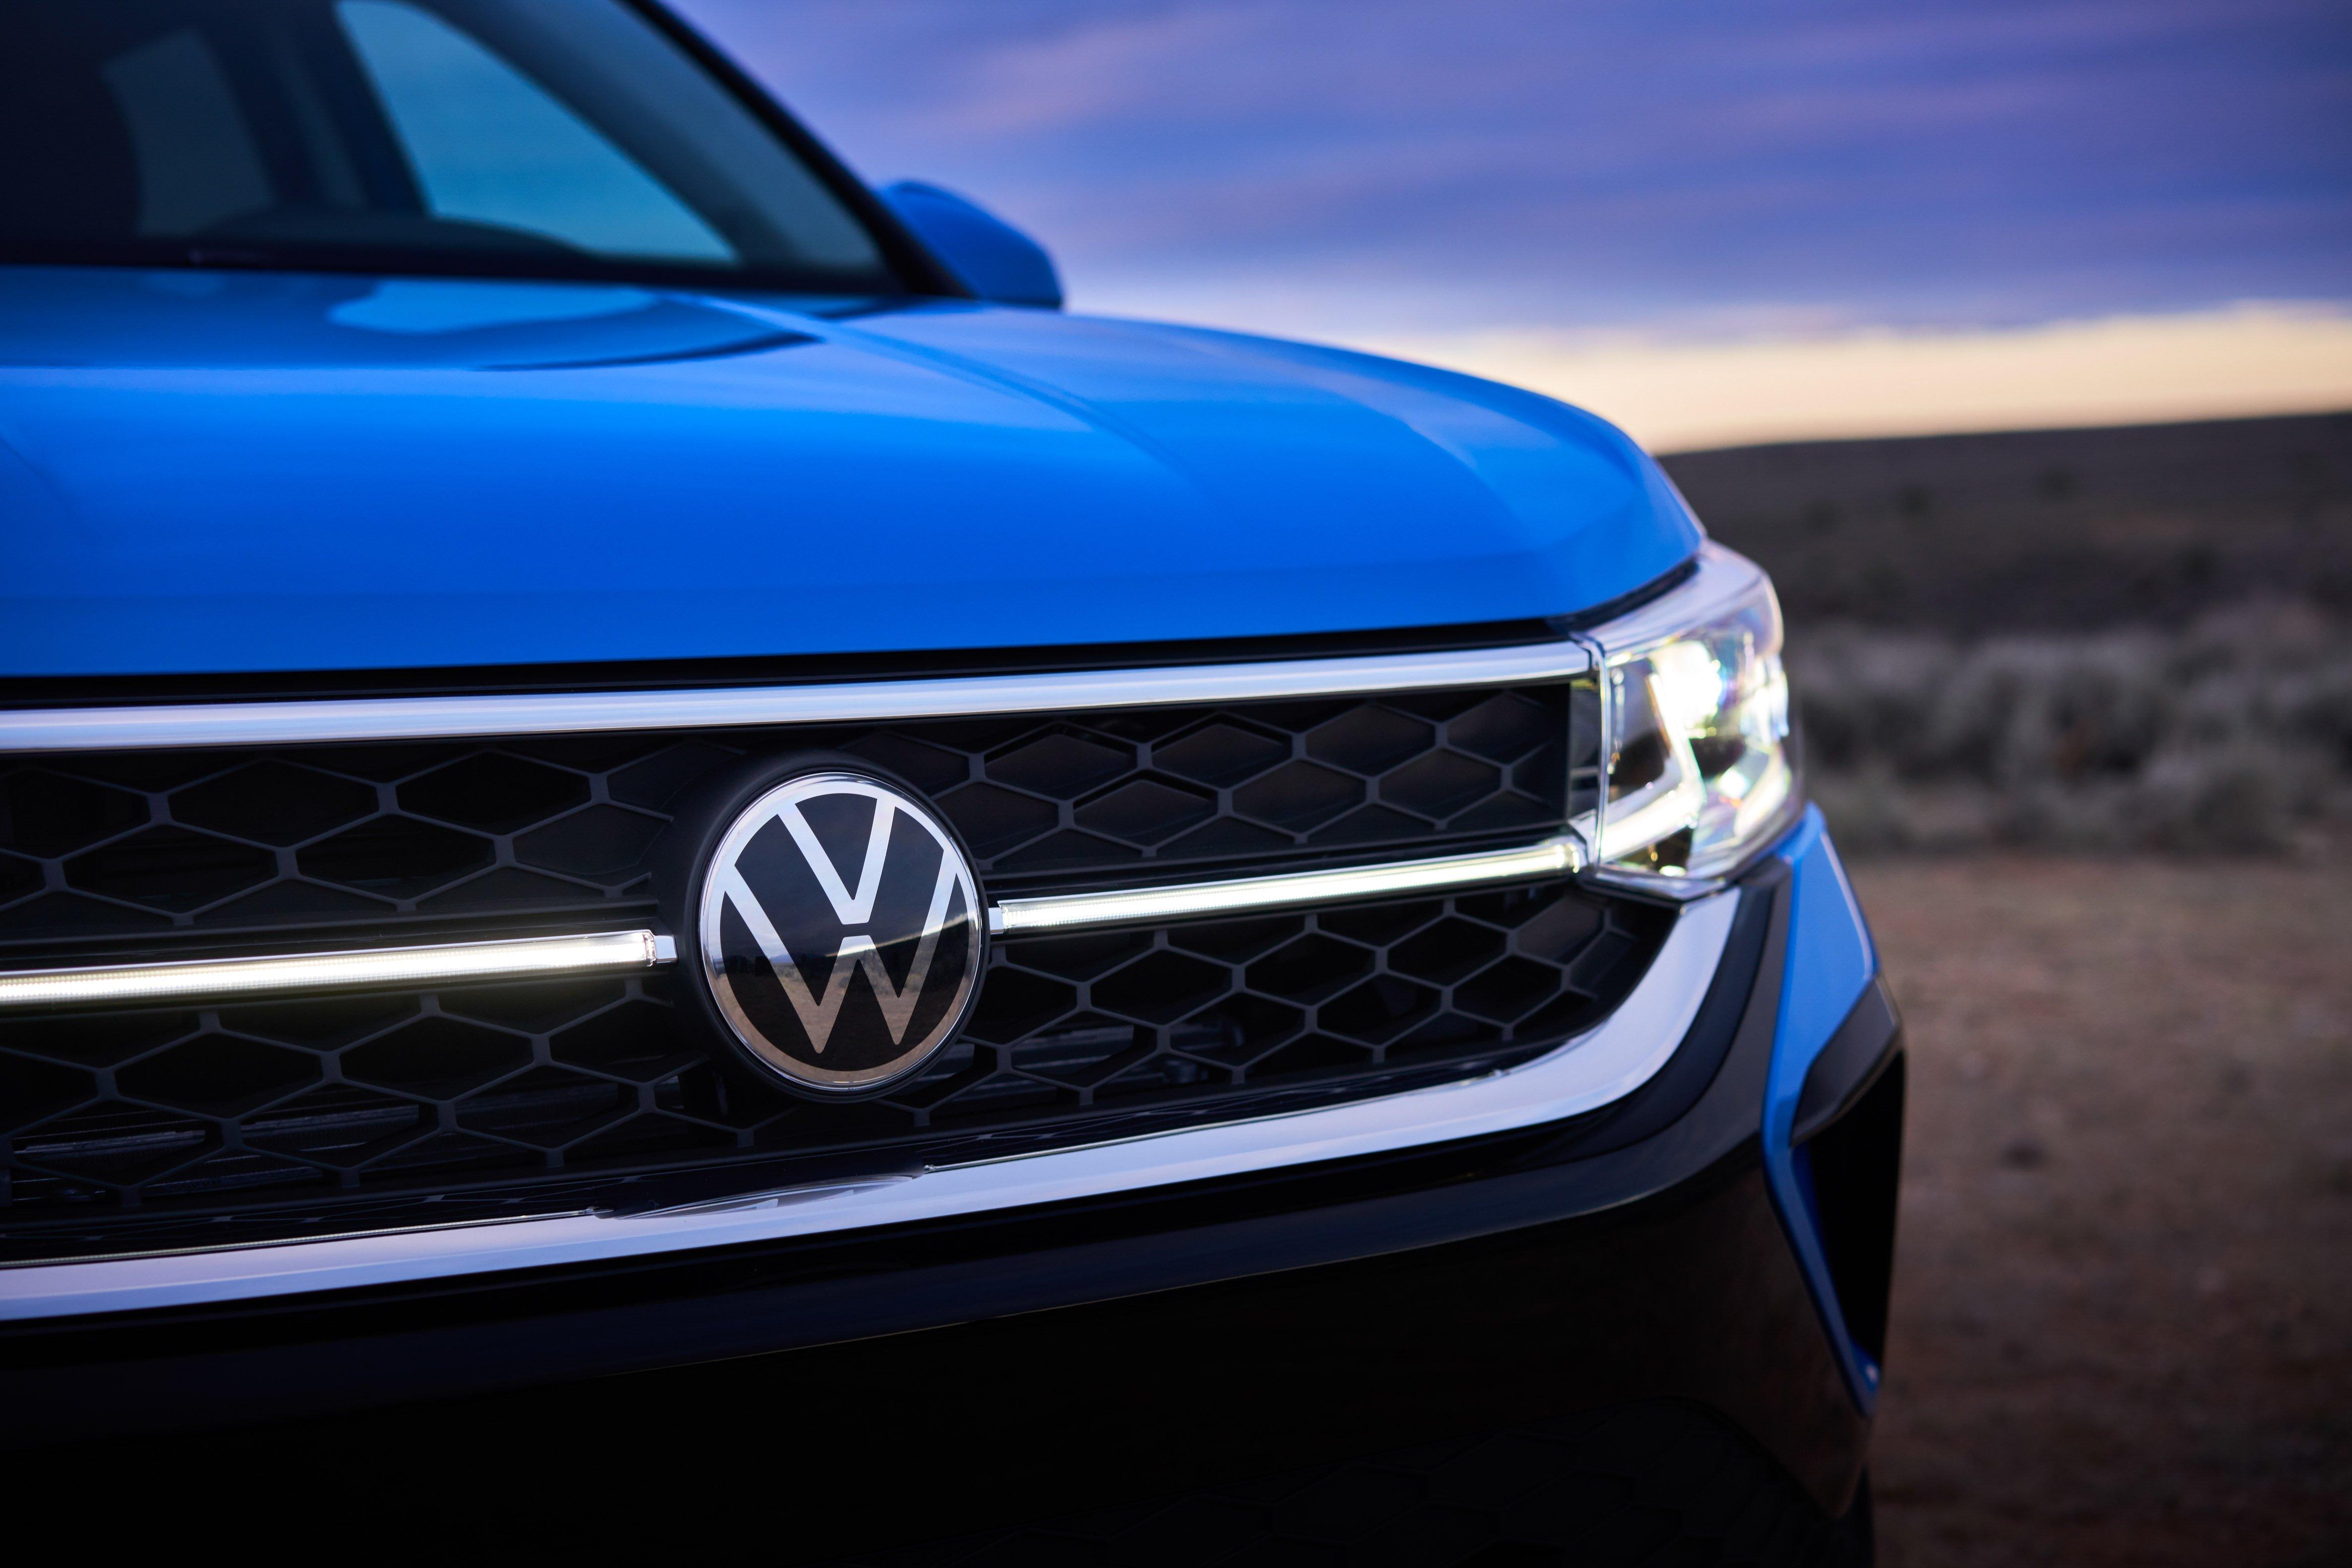 全球资讯_全新都会型时尚SUV, Volkswagen TAOS 美国全球首发 2022-Volkswagen-Taos-US-7 ...